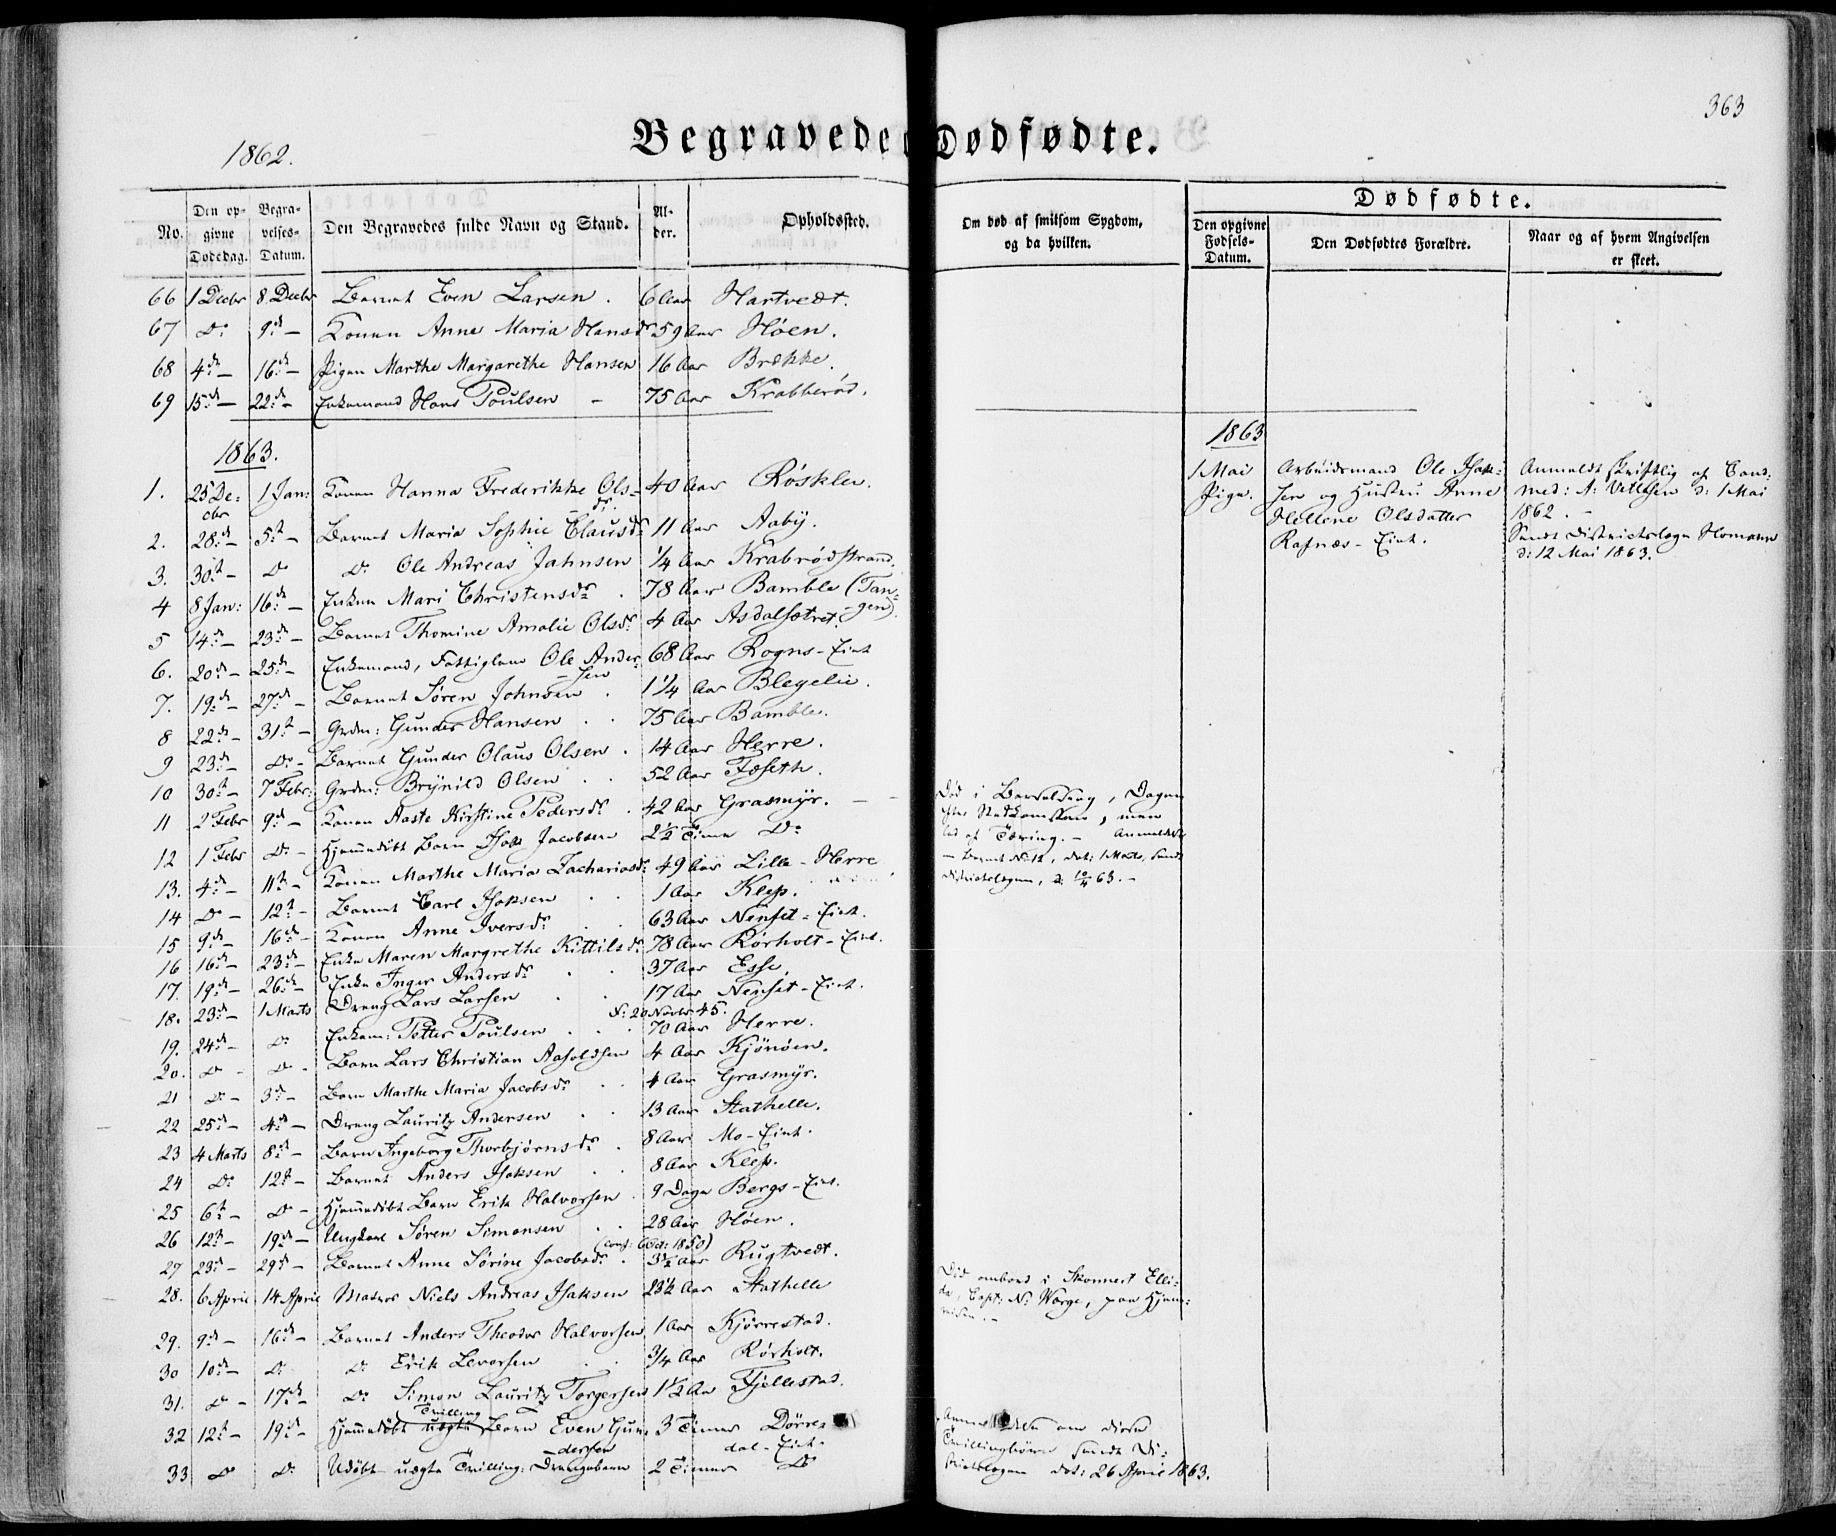 SAKO, Bamble kirkebøker, F/Fa/L0005: Ministerialbok nr. I 5, 1854-1869, s. 363